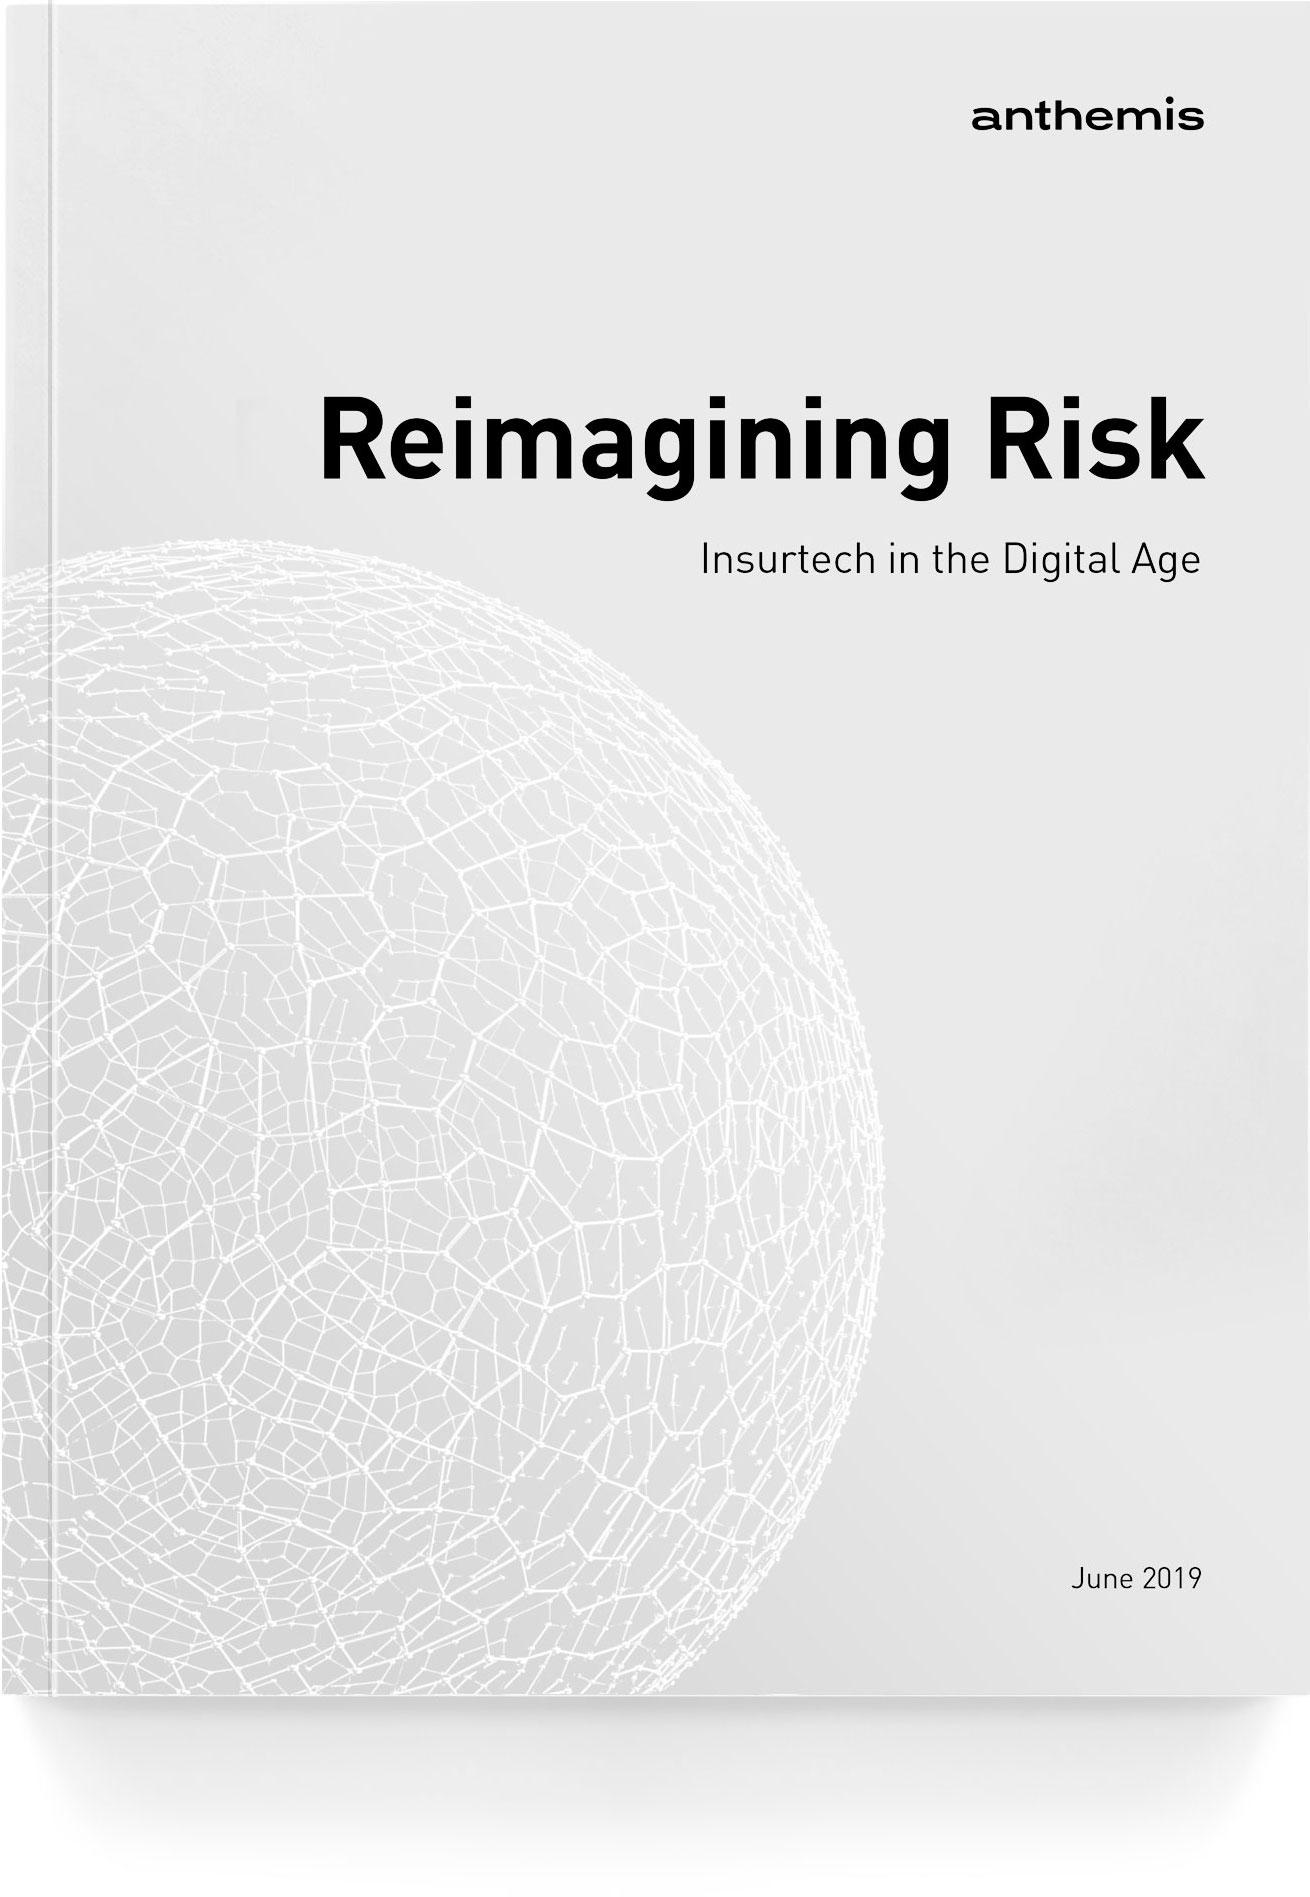 reimagining-risk-insurtech-in-the-digital-age-june-2019-cover-v2